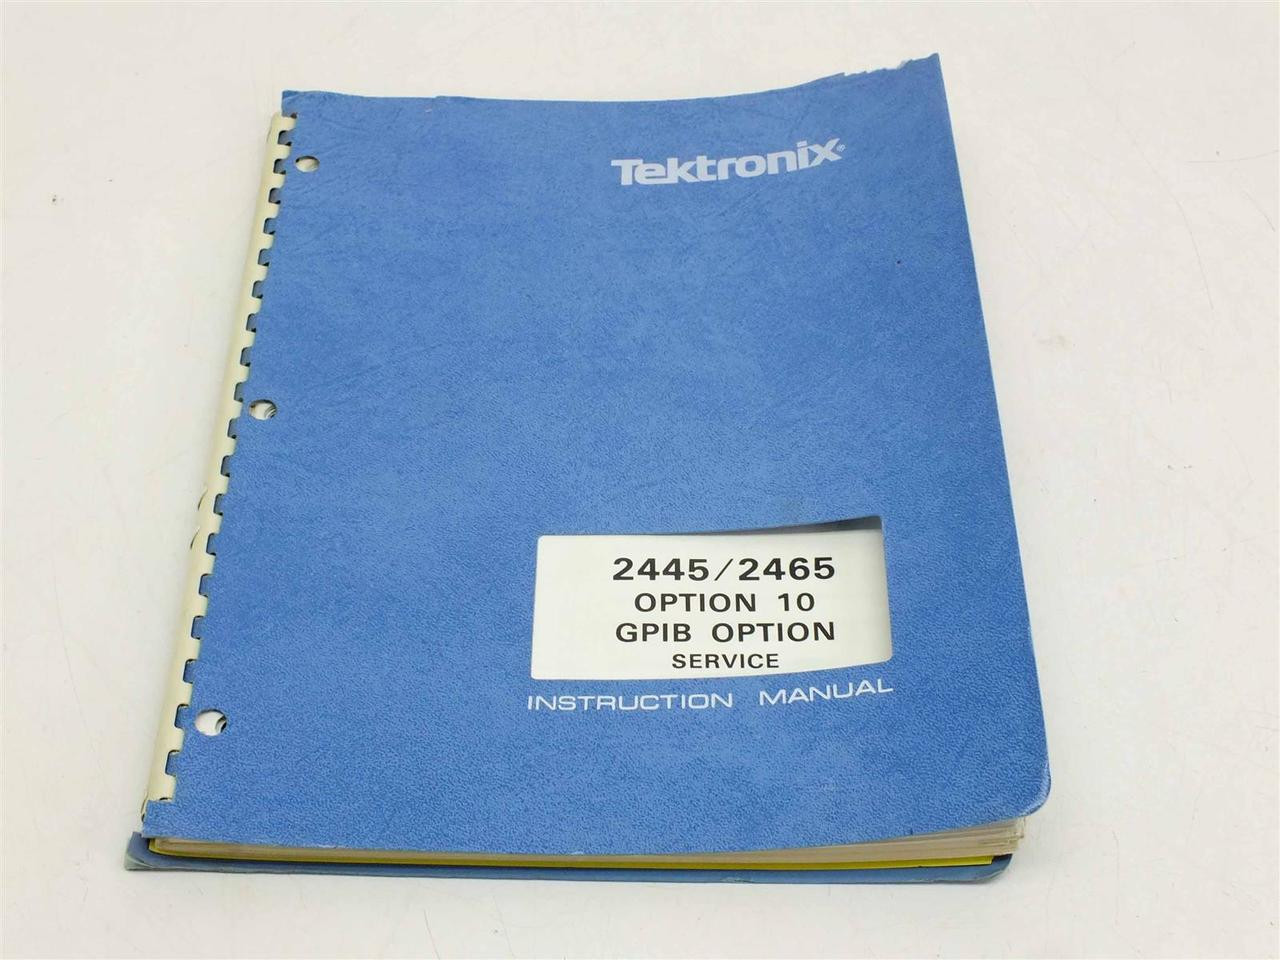 Tektronix 2445 2465 opt 10 service instruction manual tektronix 2445 2465 opt 10 service instruction manual sciox Images